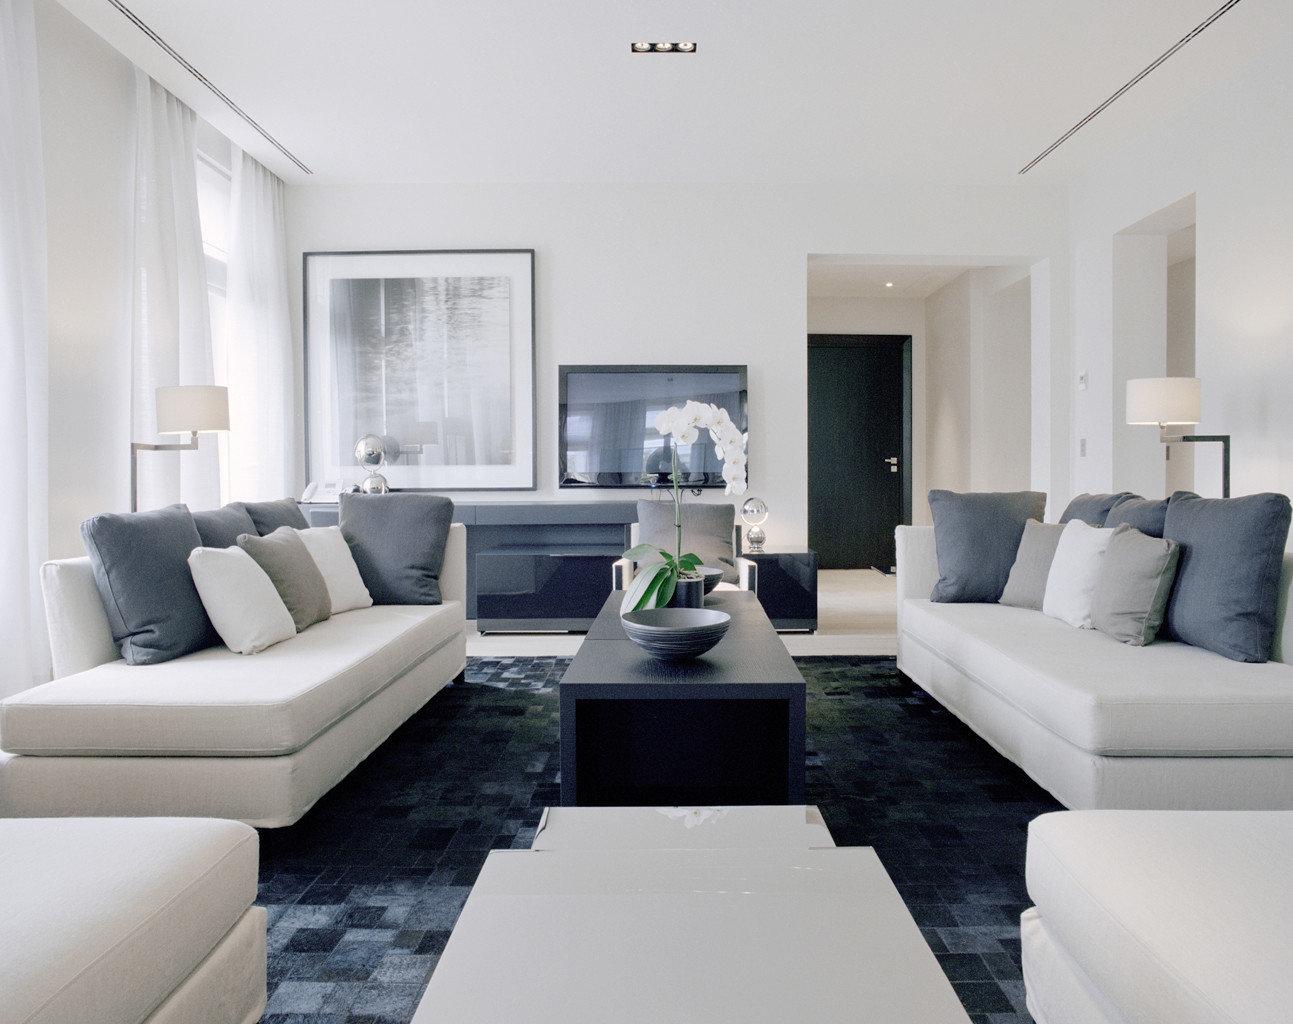 Boutique City Elegant Luxury Suite sofa living room property white condominium home Modern pillow seat flat leather